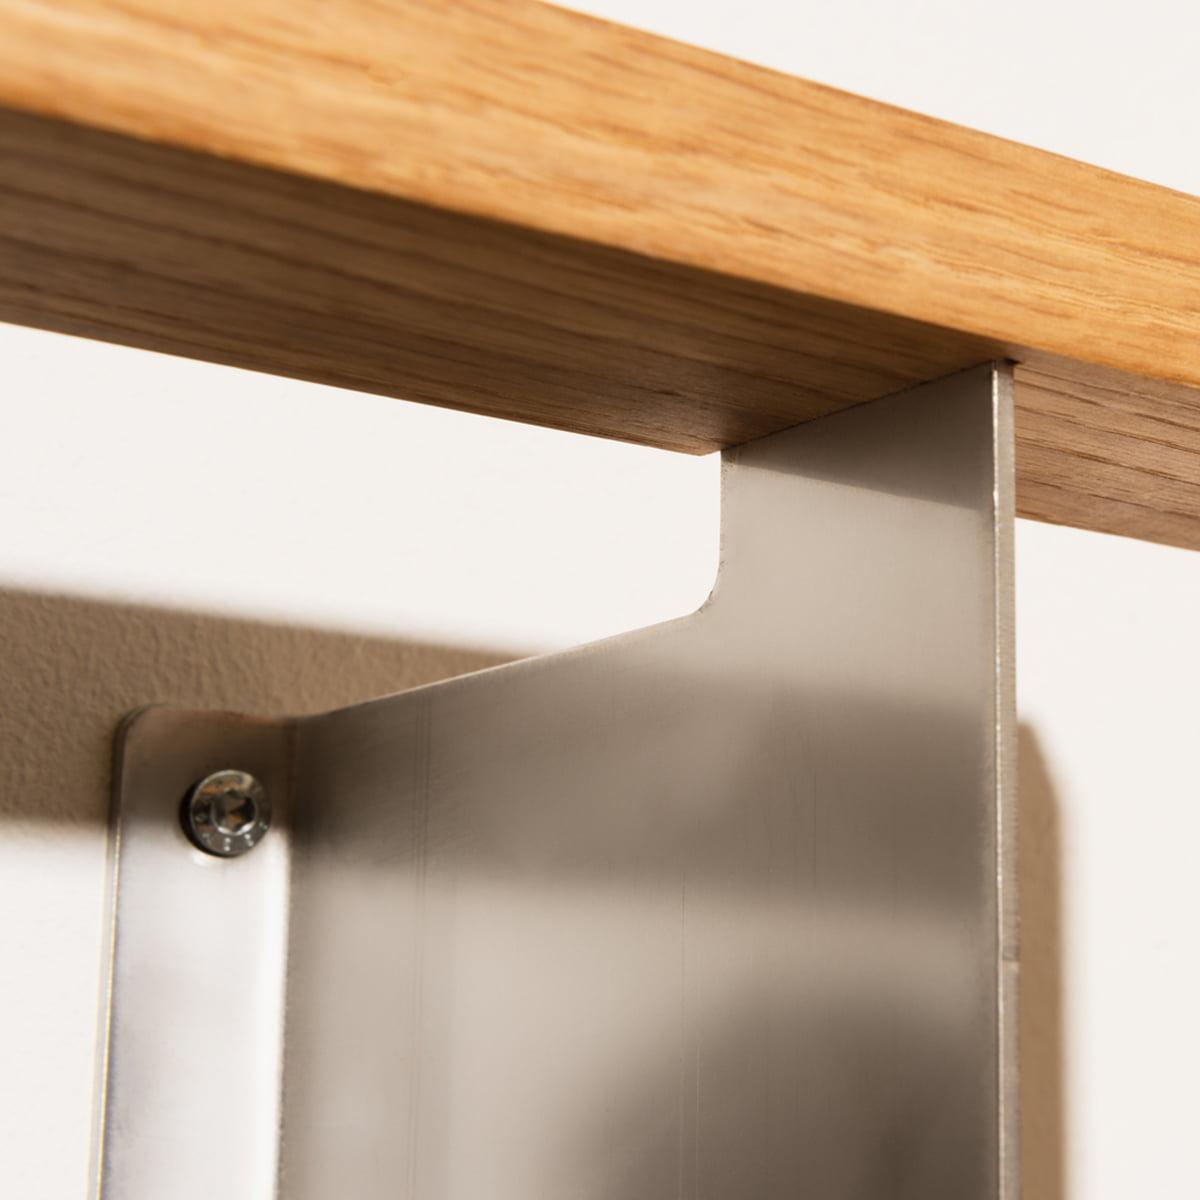 das kleine b regal b h 340 mm. Black Bedroom Furniture Sets. Home Design Ideas